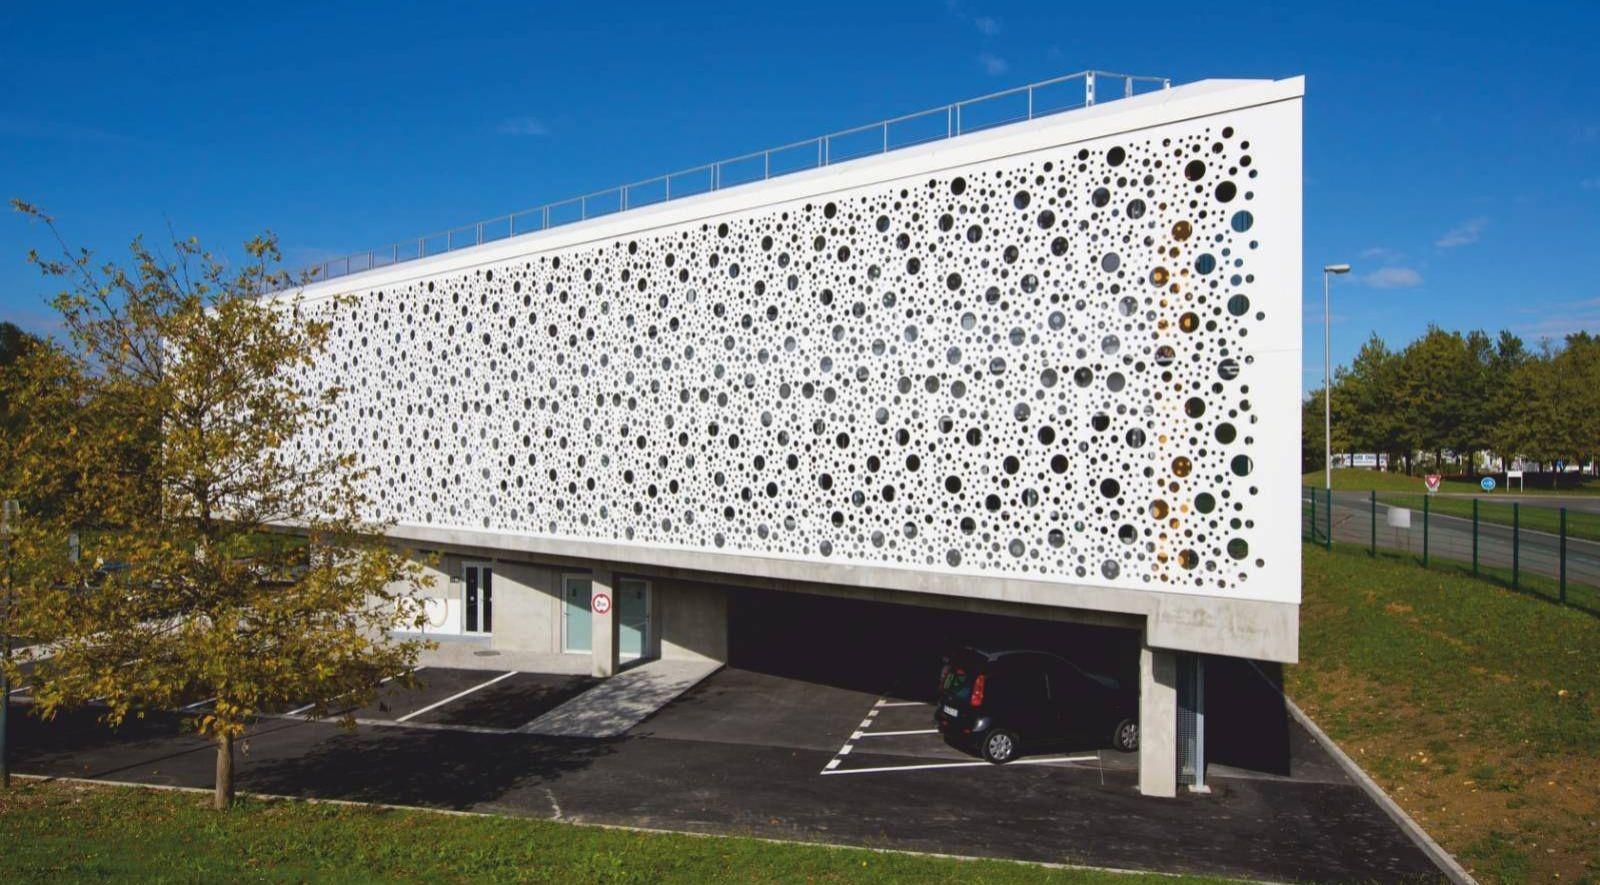 10 Examples of Innovative facade design solutions - Sheet11